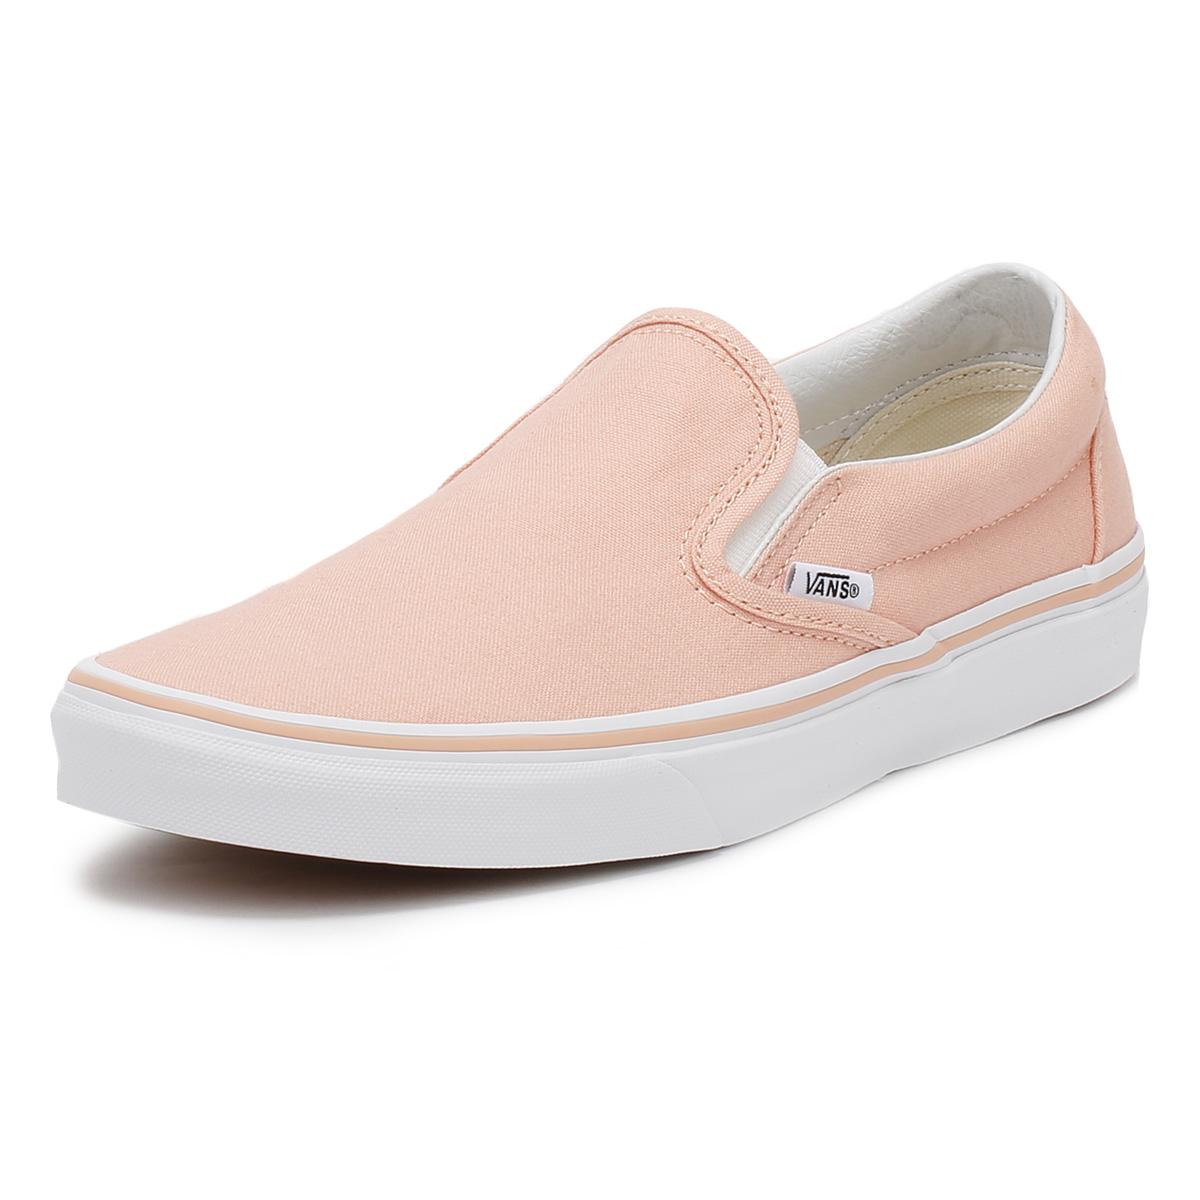 Vans UA Classic Slip-On, Zapatillas para Mujer, Rosa (Tropical Peach/True White), 40.5 EU